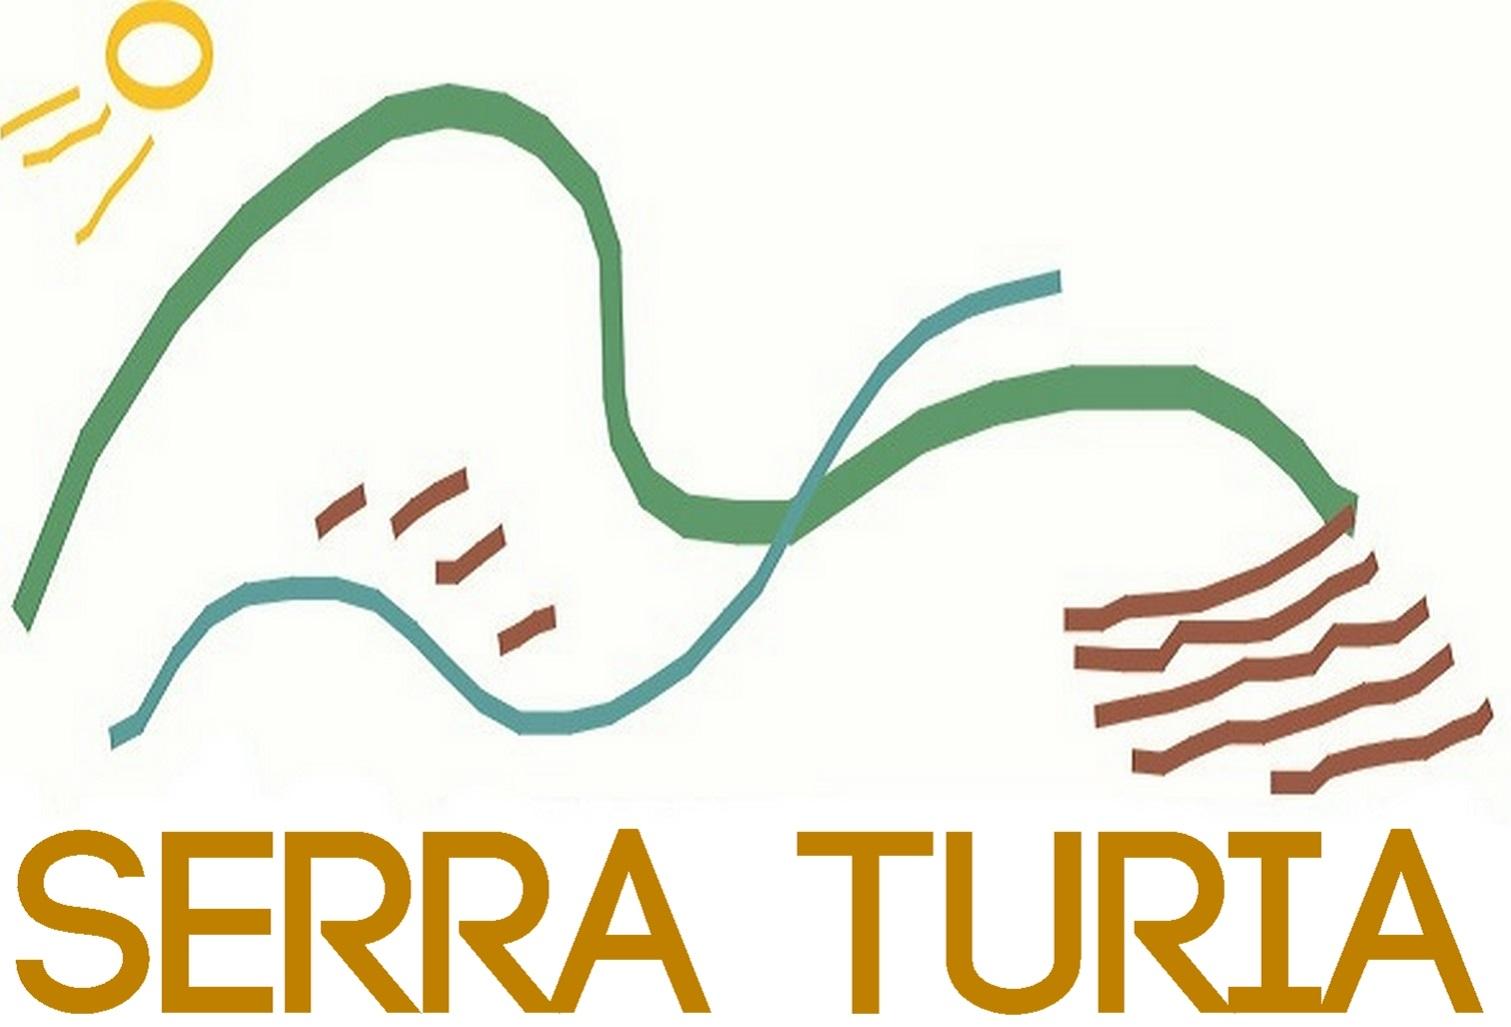 Agrícola Serra Turia S. Coop.